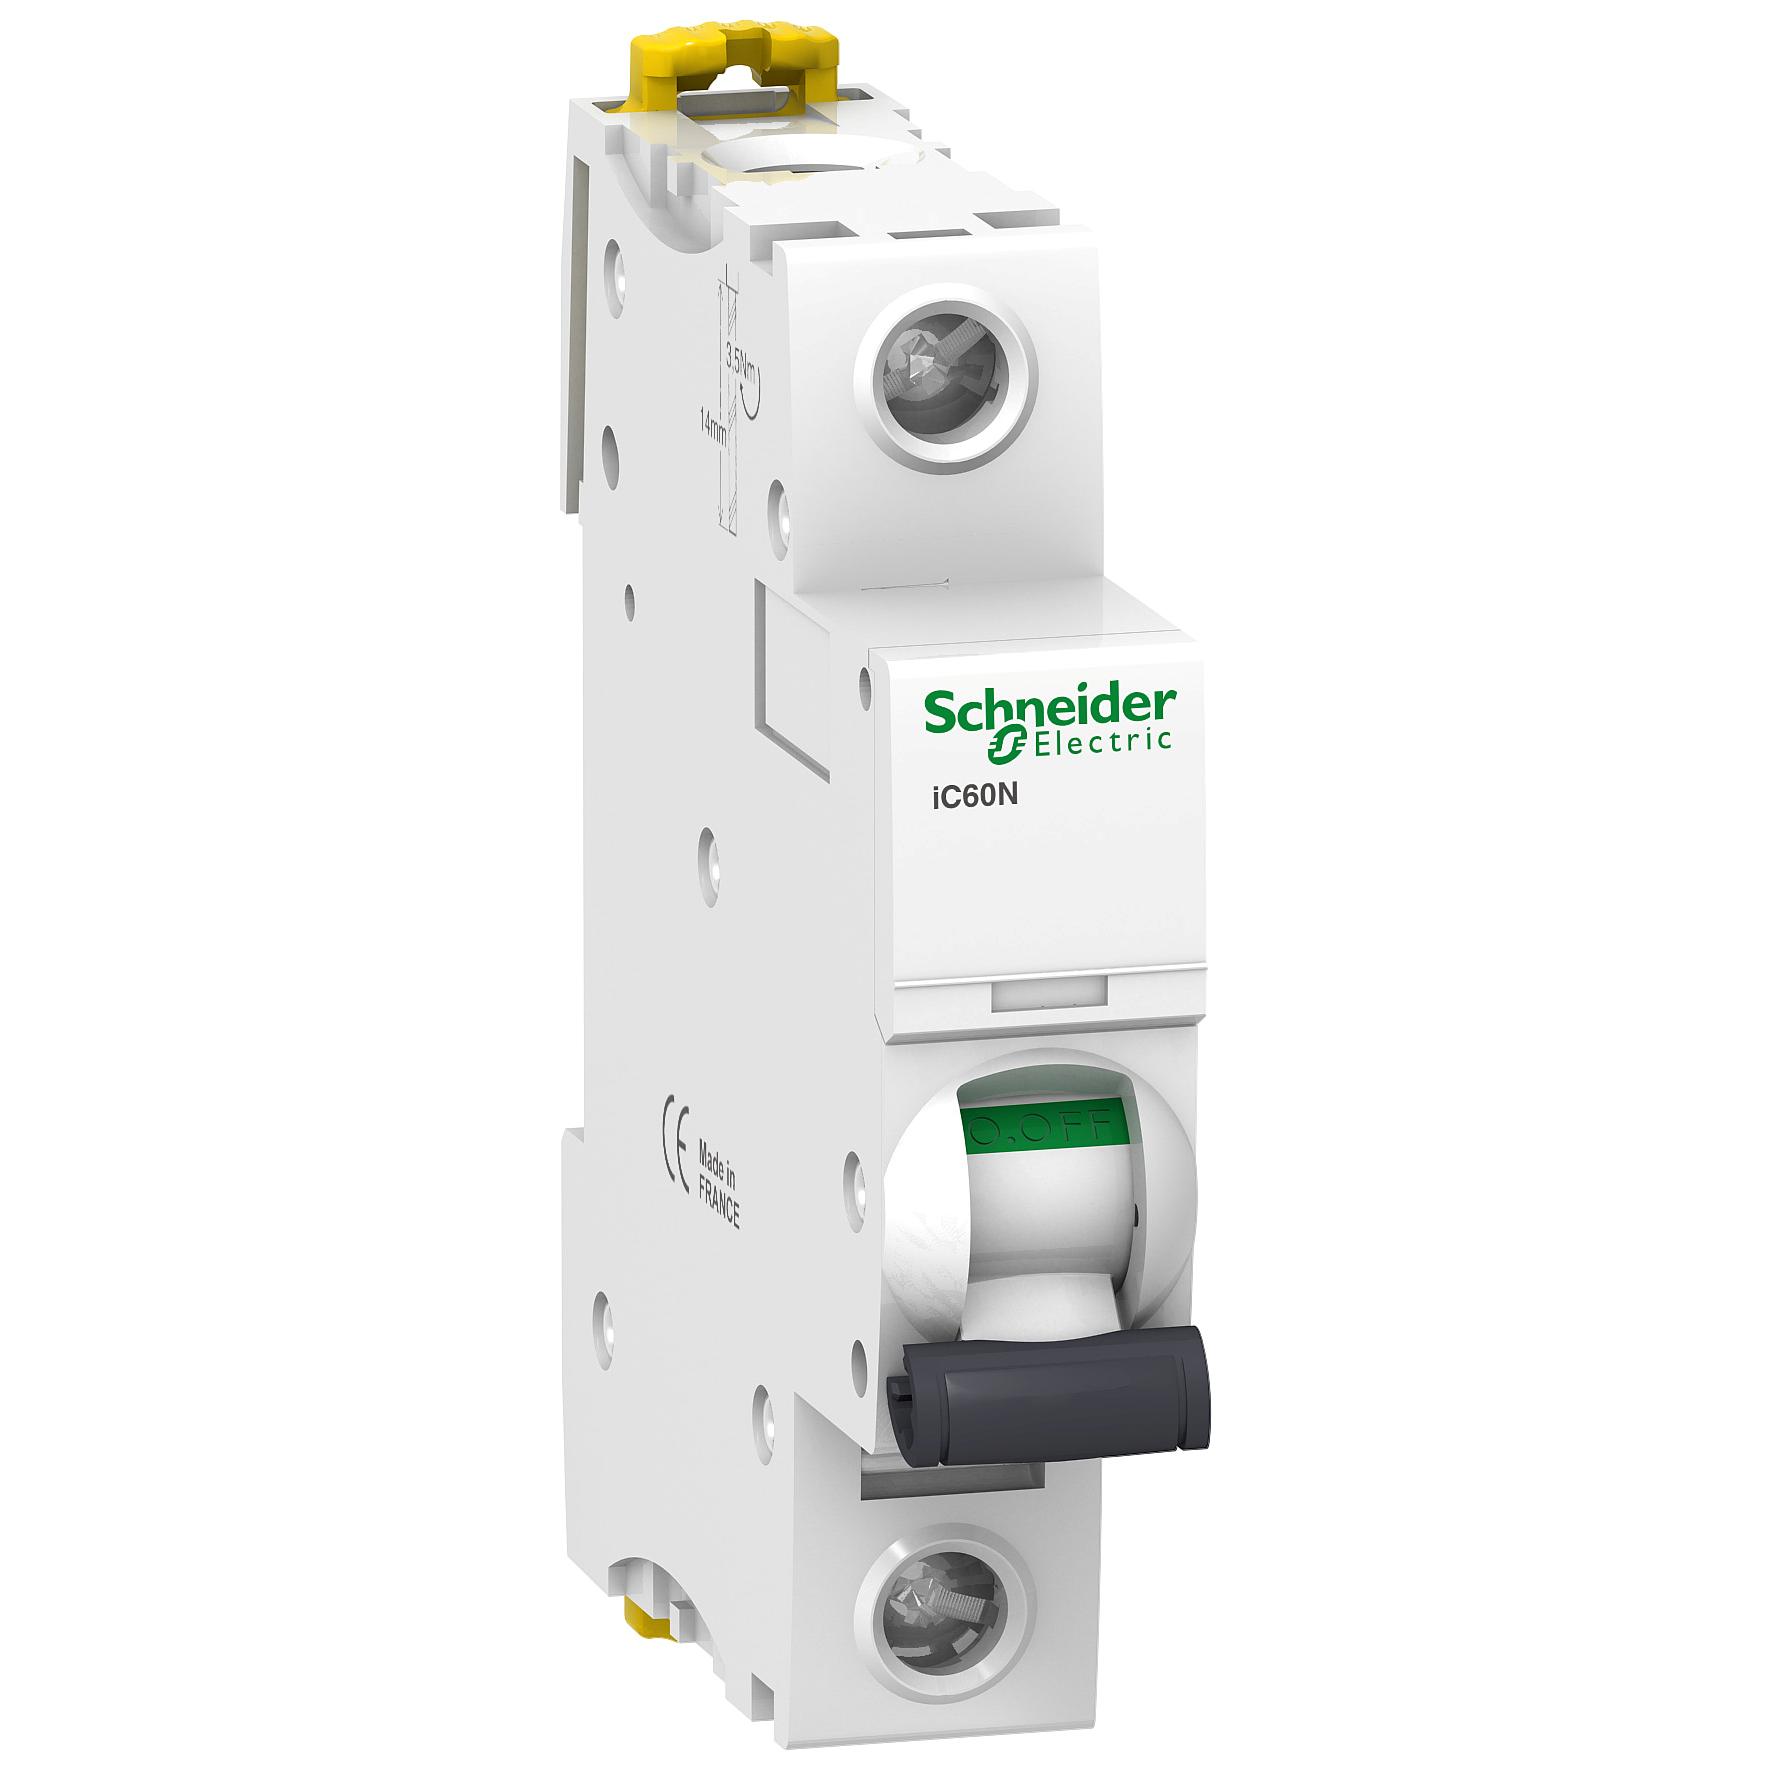 Schneider Electric - SCHNEİDER ELECTRİC 1X25A 6KA B TİPİ İC60N OTOMAT 3606480079047